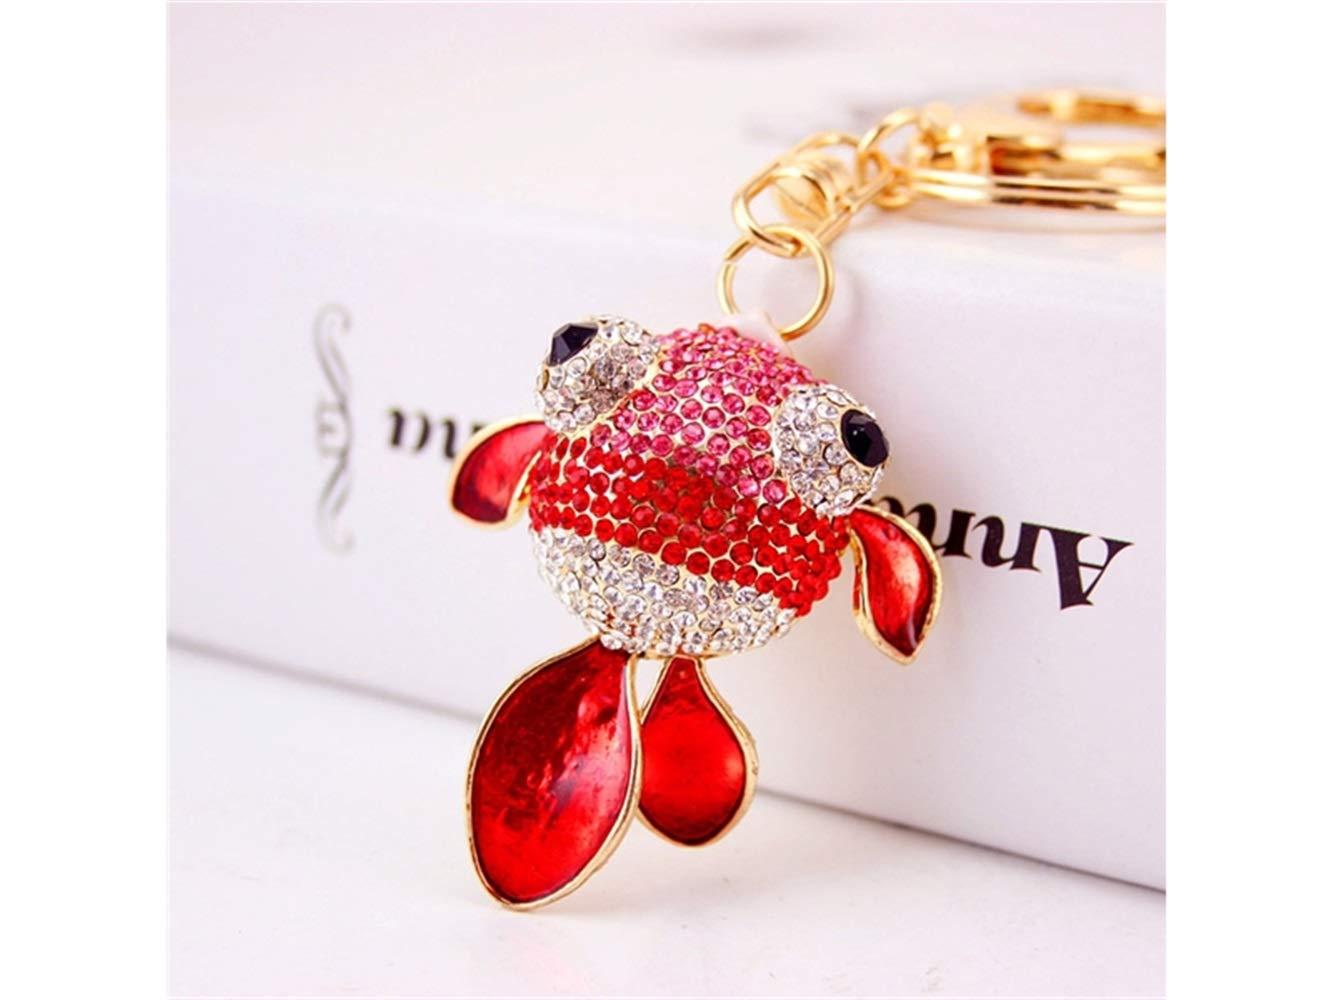 Car Keychain, Cute Diamond Goldfish Keychain Animal Key Trinket Car Bag Key Holder Decorations(Red) for Gift